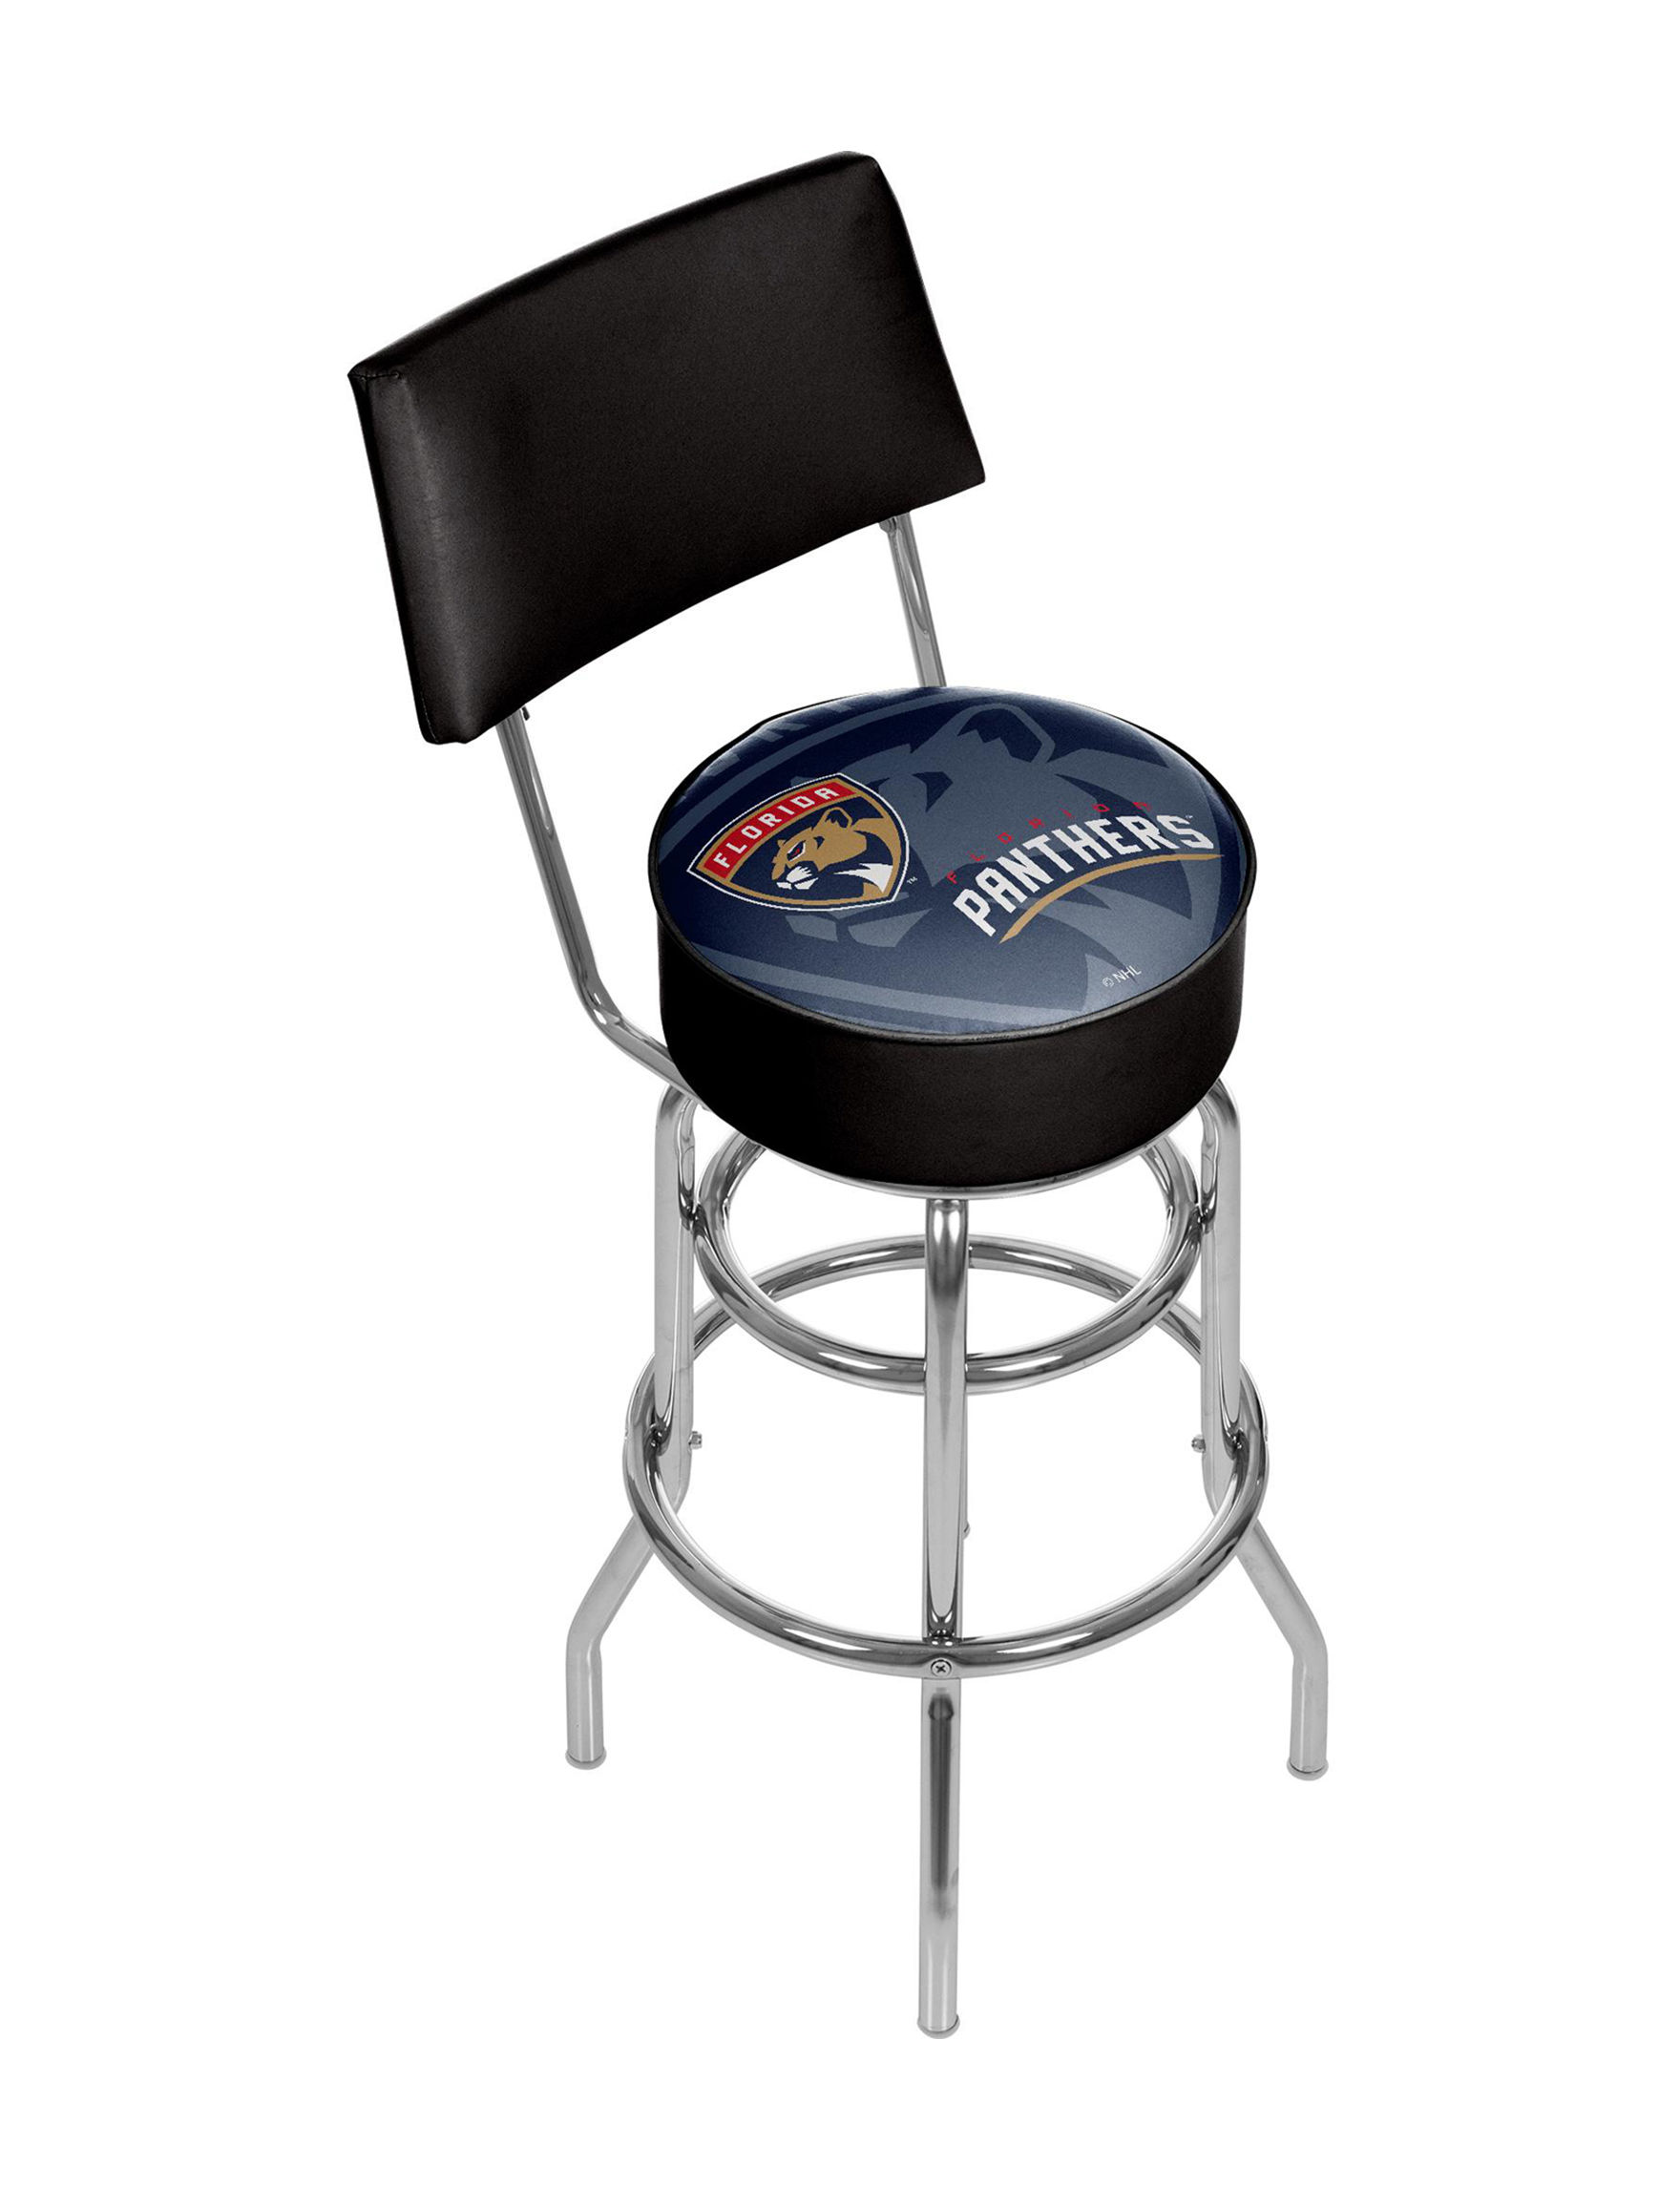 Trademark Global Blue / Black Bar & Kitchen Stools Game Room Kitchen & Dining Furniture